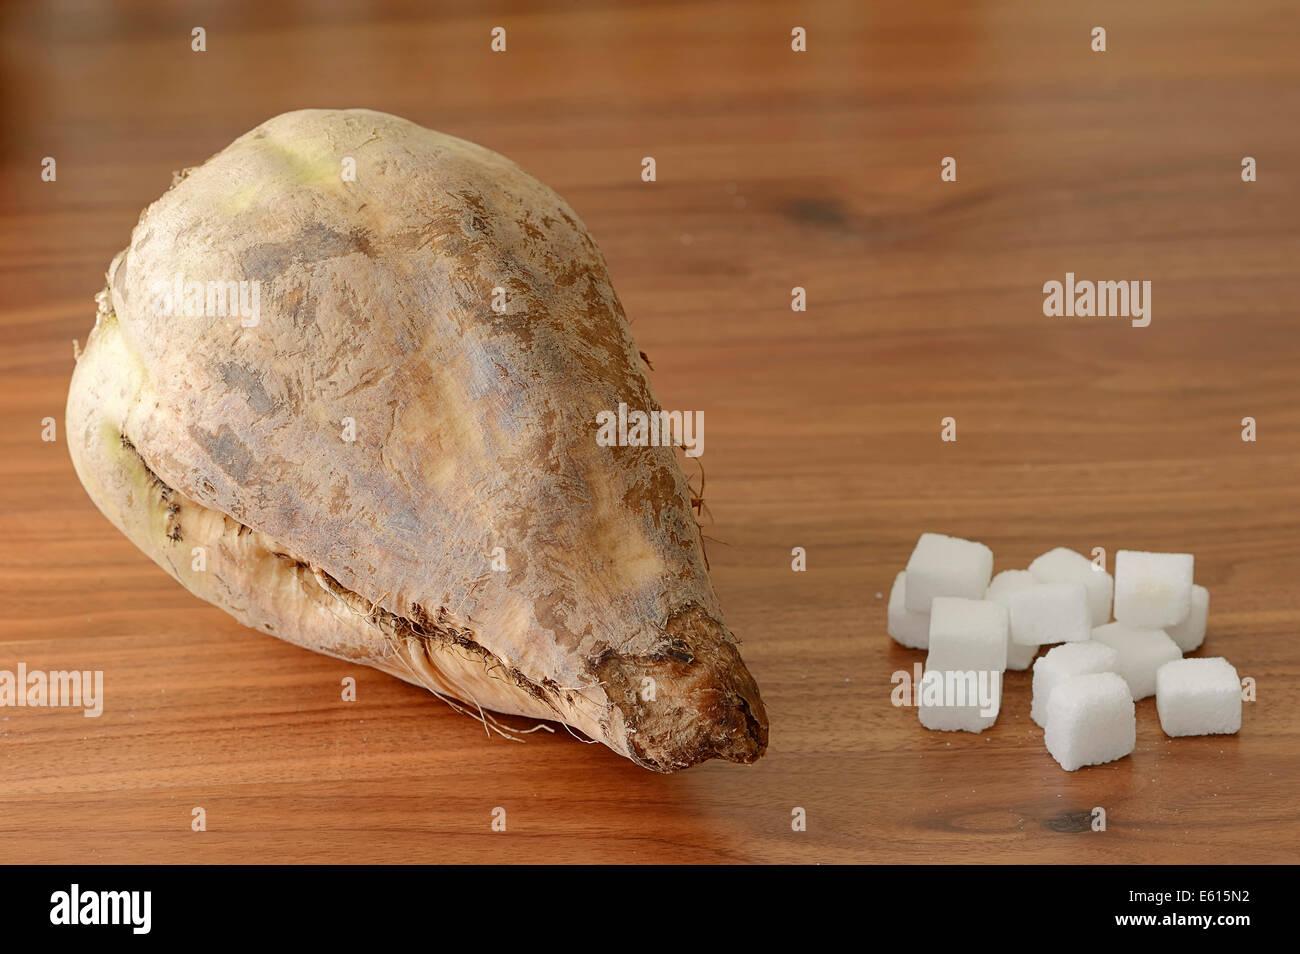 Sugar Beet (Beta vulgaris ssp. vulgaris var. altissima) and sugar cubes, white sugar, refined sugar - Stock Image